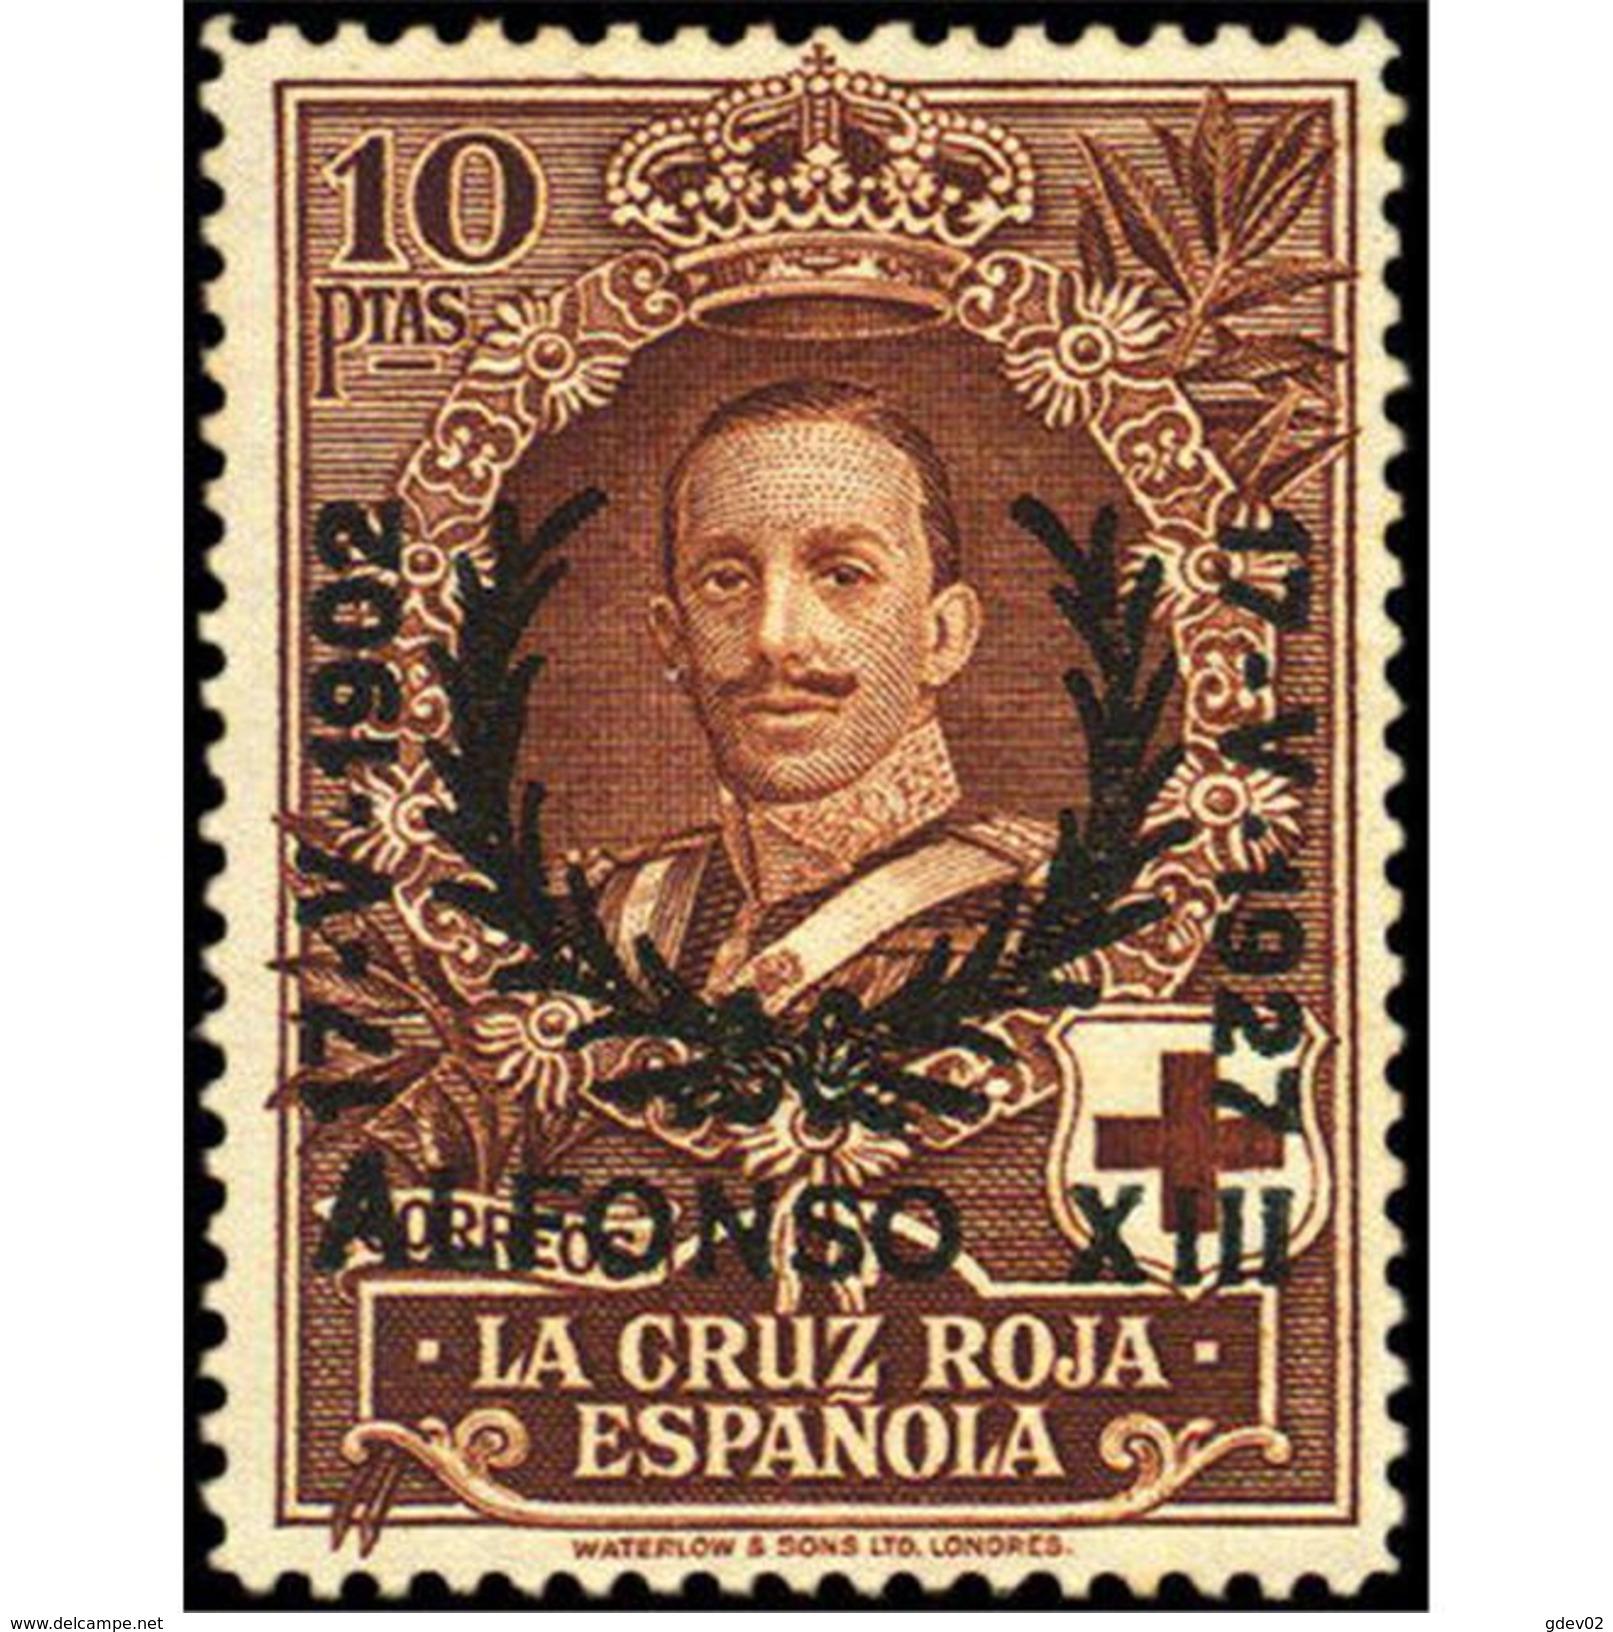 ES361STV-LFT*361S.España. Spain   Espagne.JUBILEO DEL REY  ALFONSO Xlll.1927 (Ed 361*) MAGNIFICO - 1889-1931 Reino: Alfonso XIII